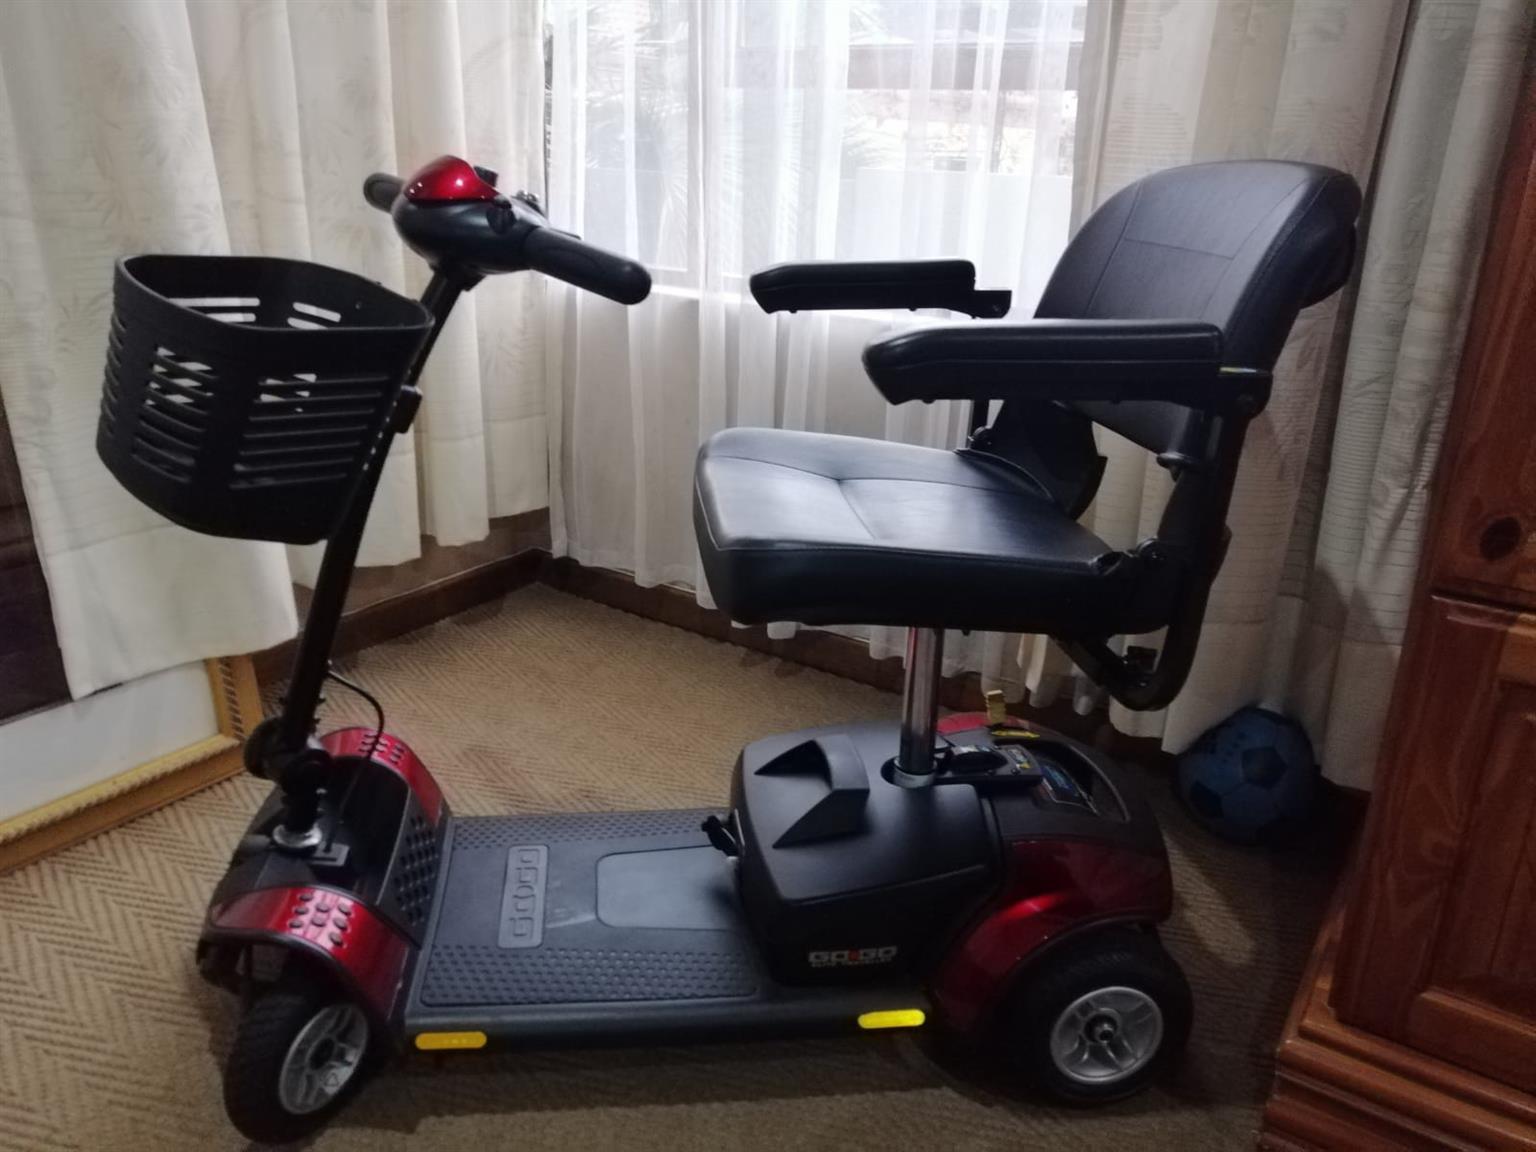 GO GO Elite (shop rider) for sale